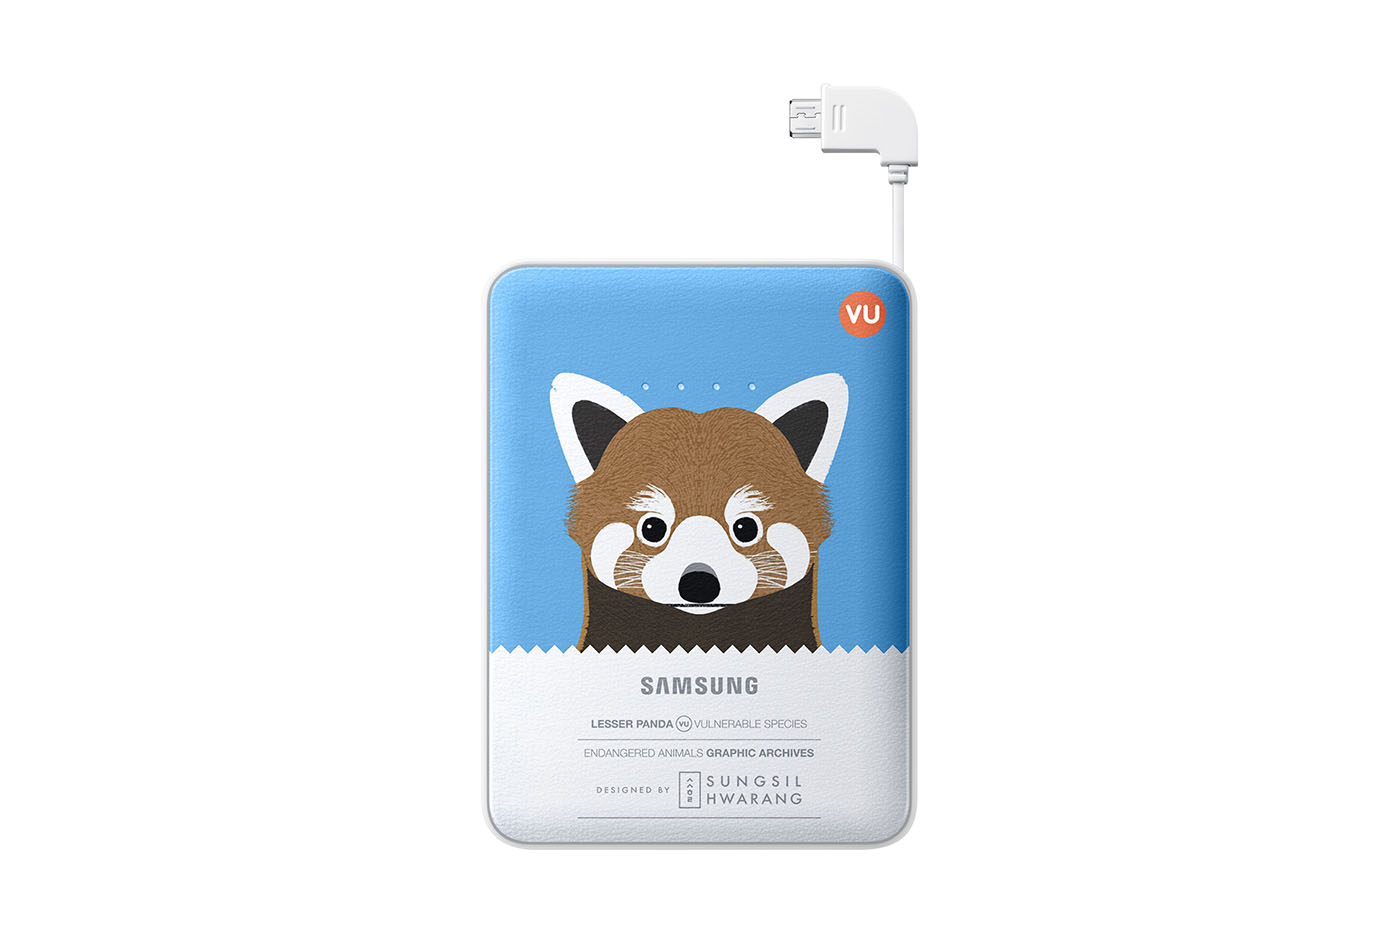 Samsung Battery Pack_ LESSER PANDA 8